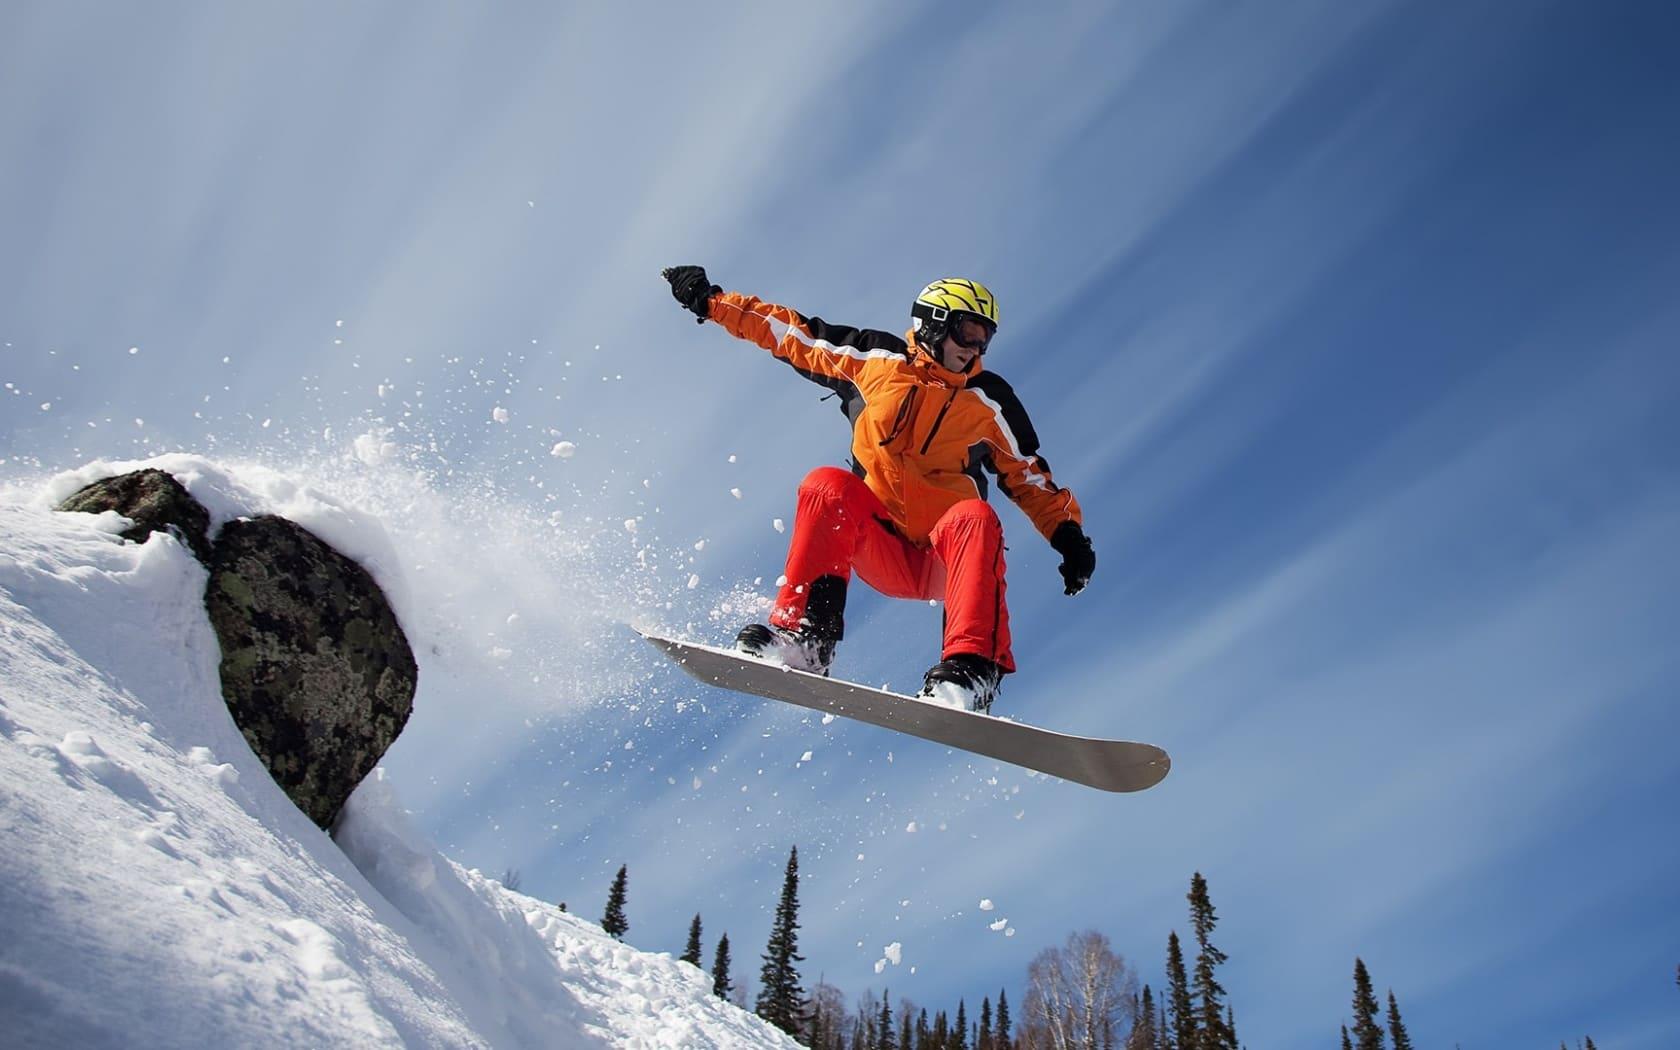 ws_Snowboarding_1680x1050